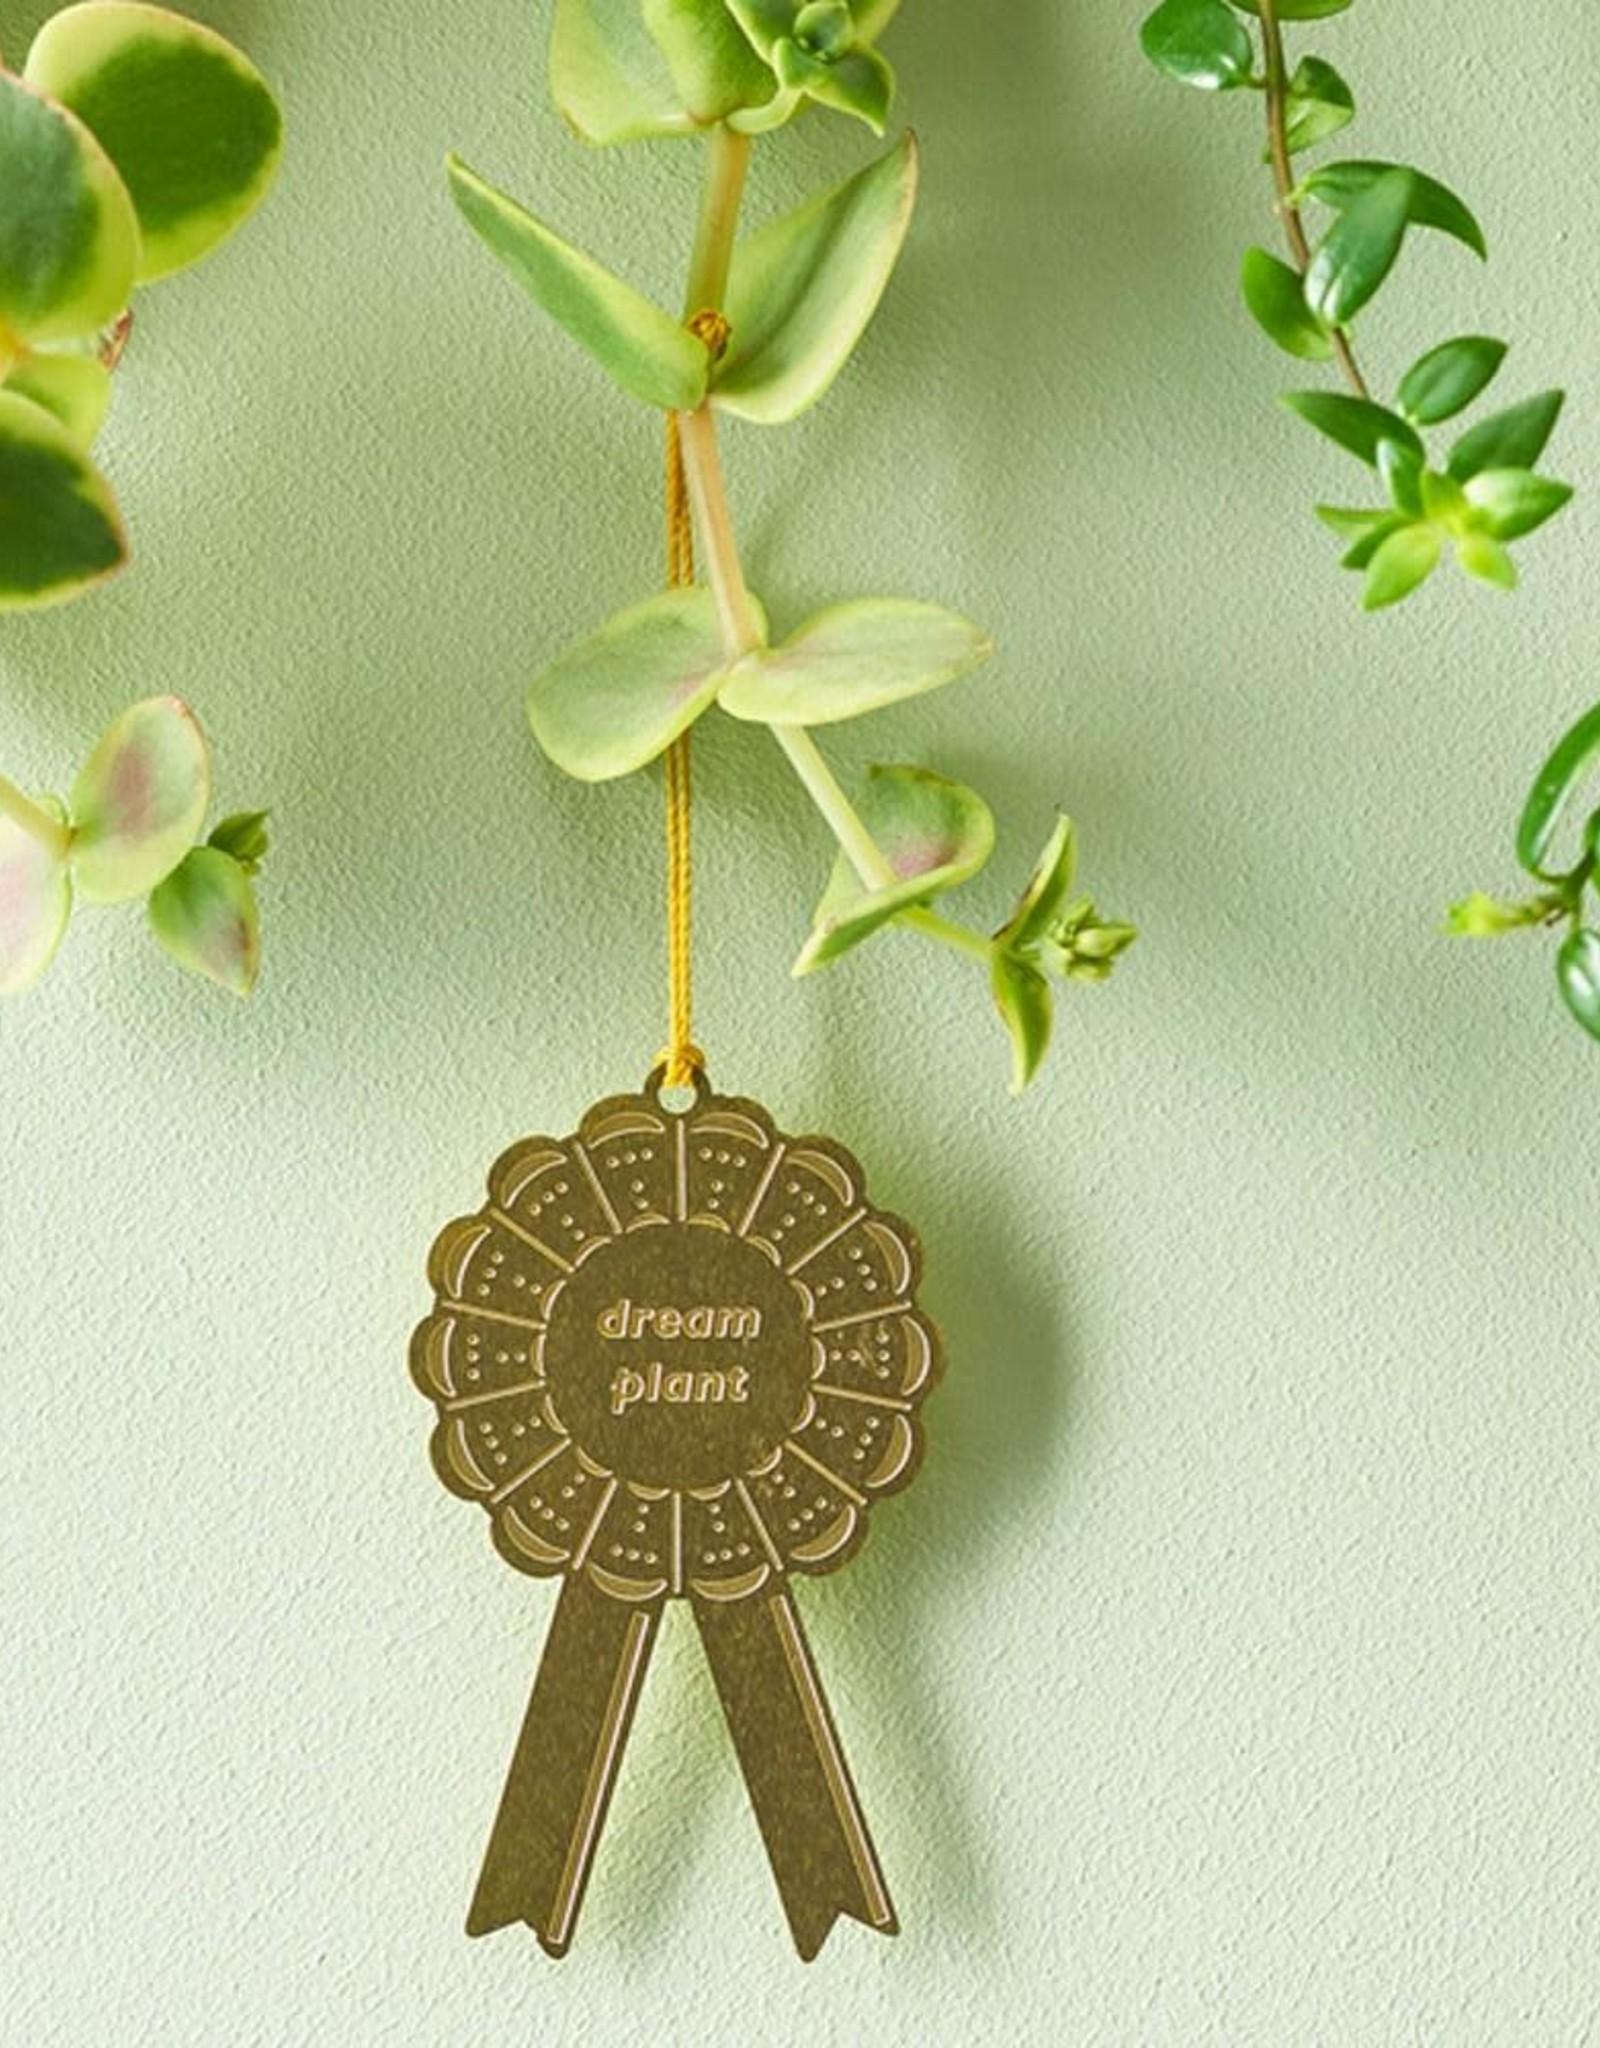 another studio Plant Awards Dream Plant